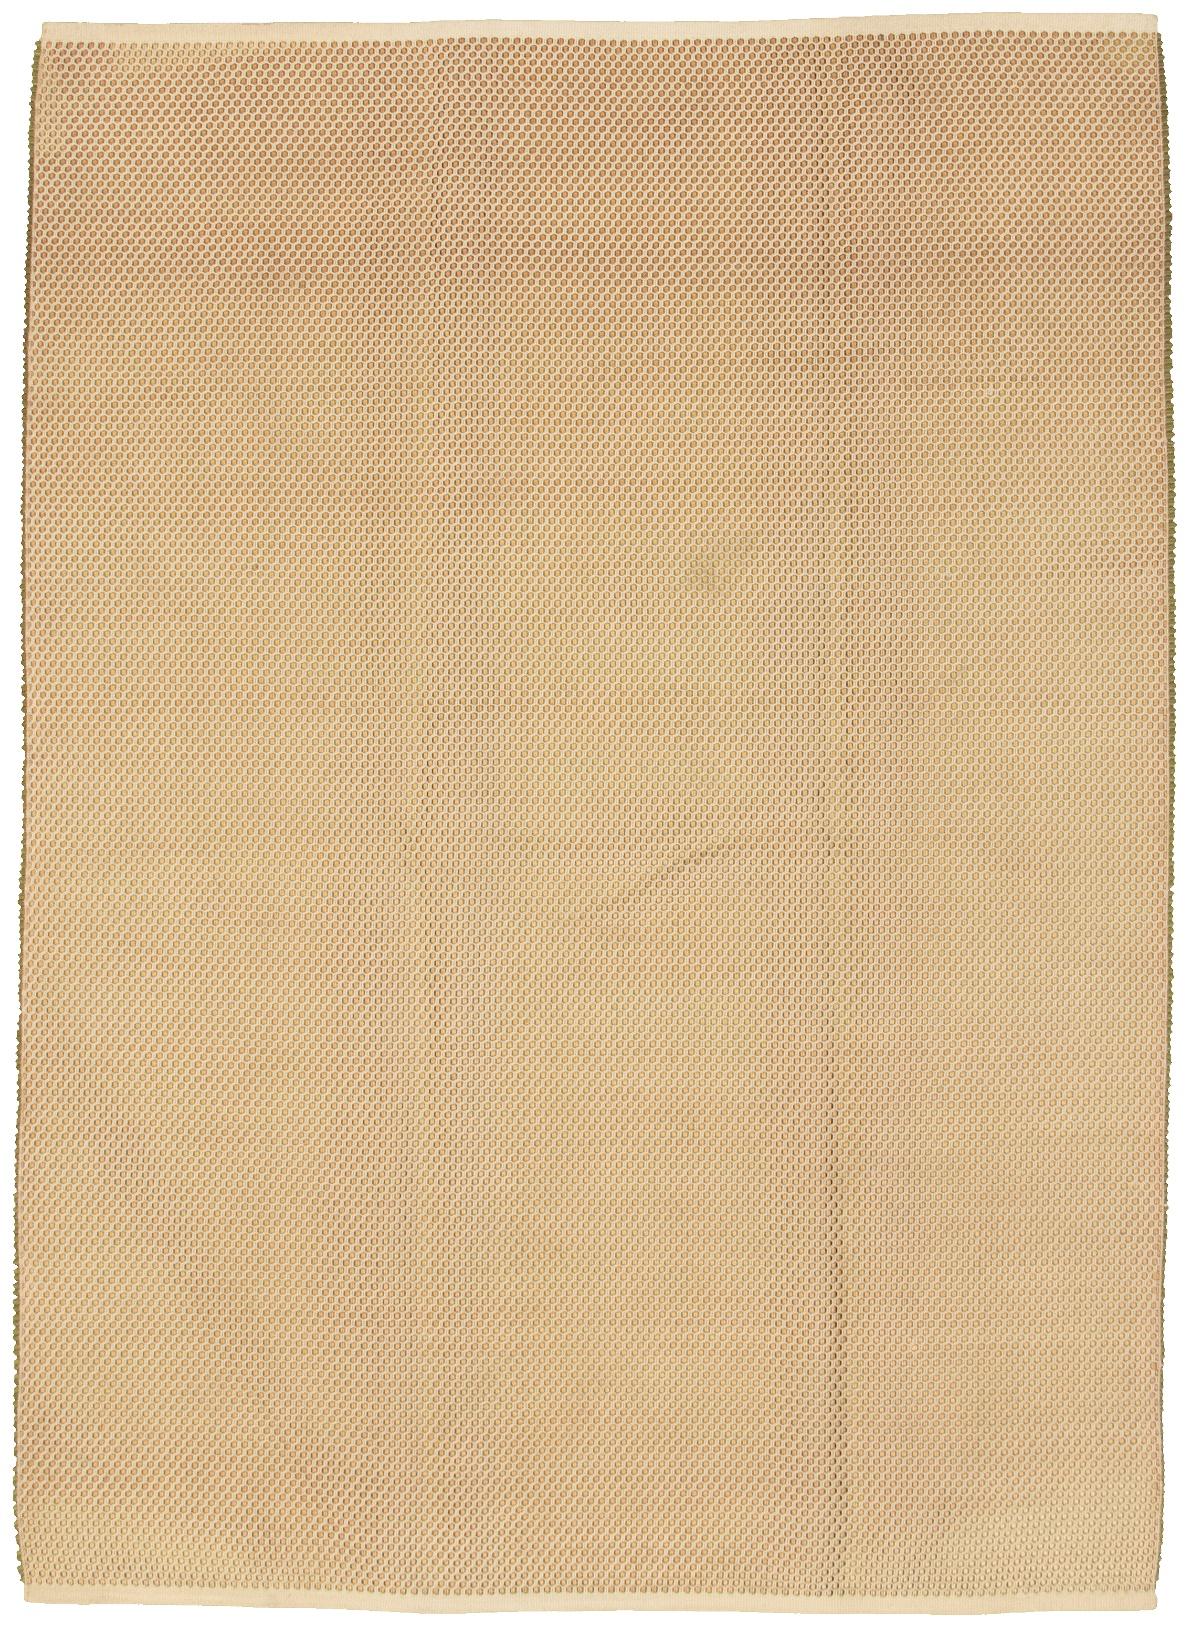 "Handmade Honeycomb III Light Gold Cotton/Polyester Rug 5'7"" x 8'0"" Size: 5'7"" x 8'0"""